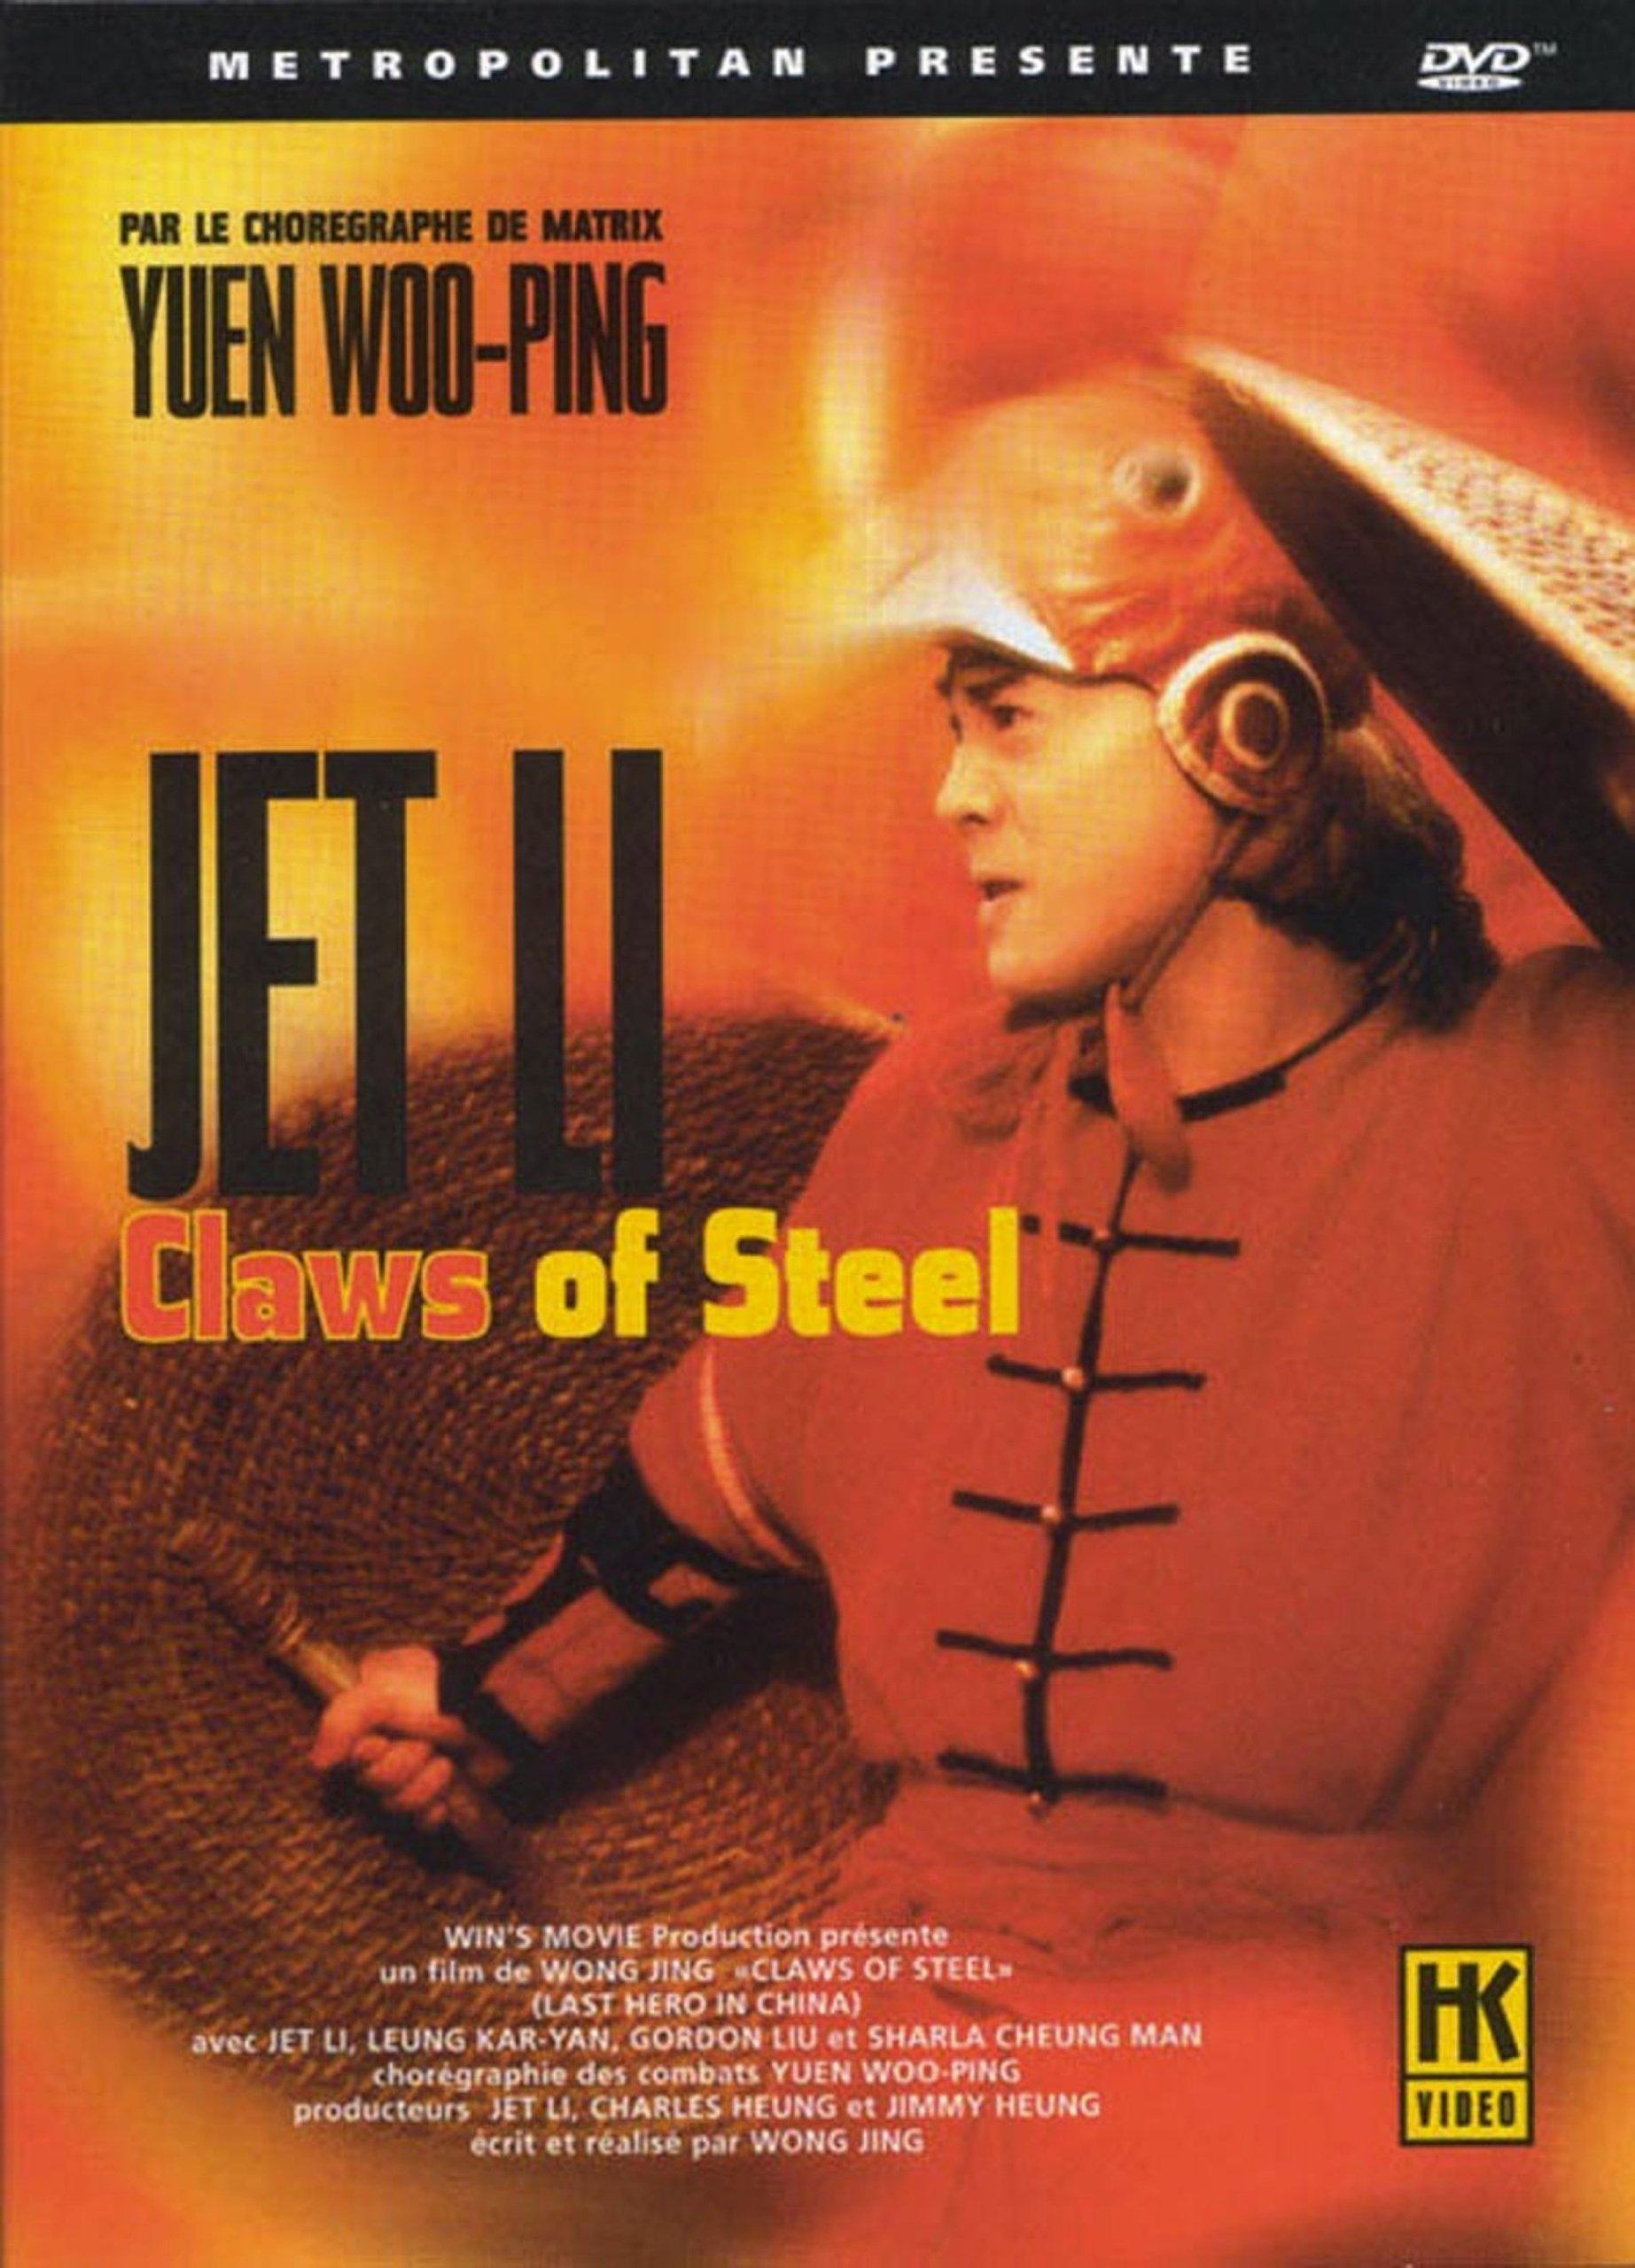 hero jet li soundtrack download